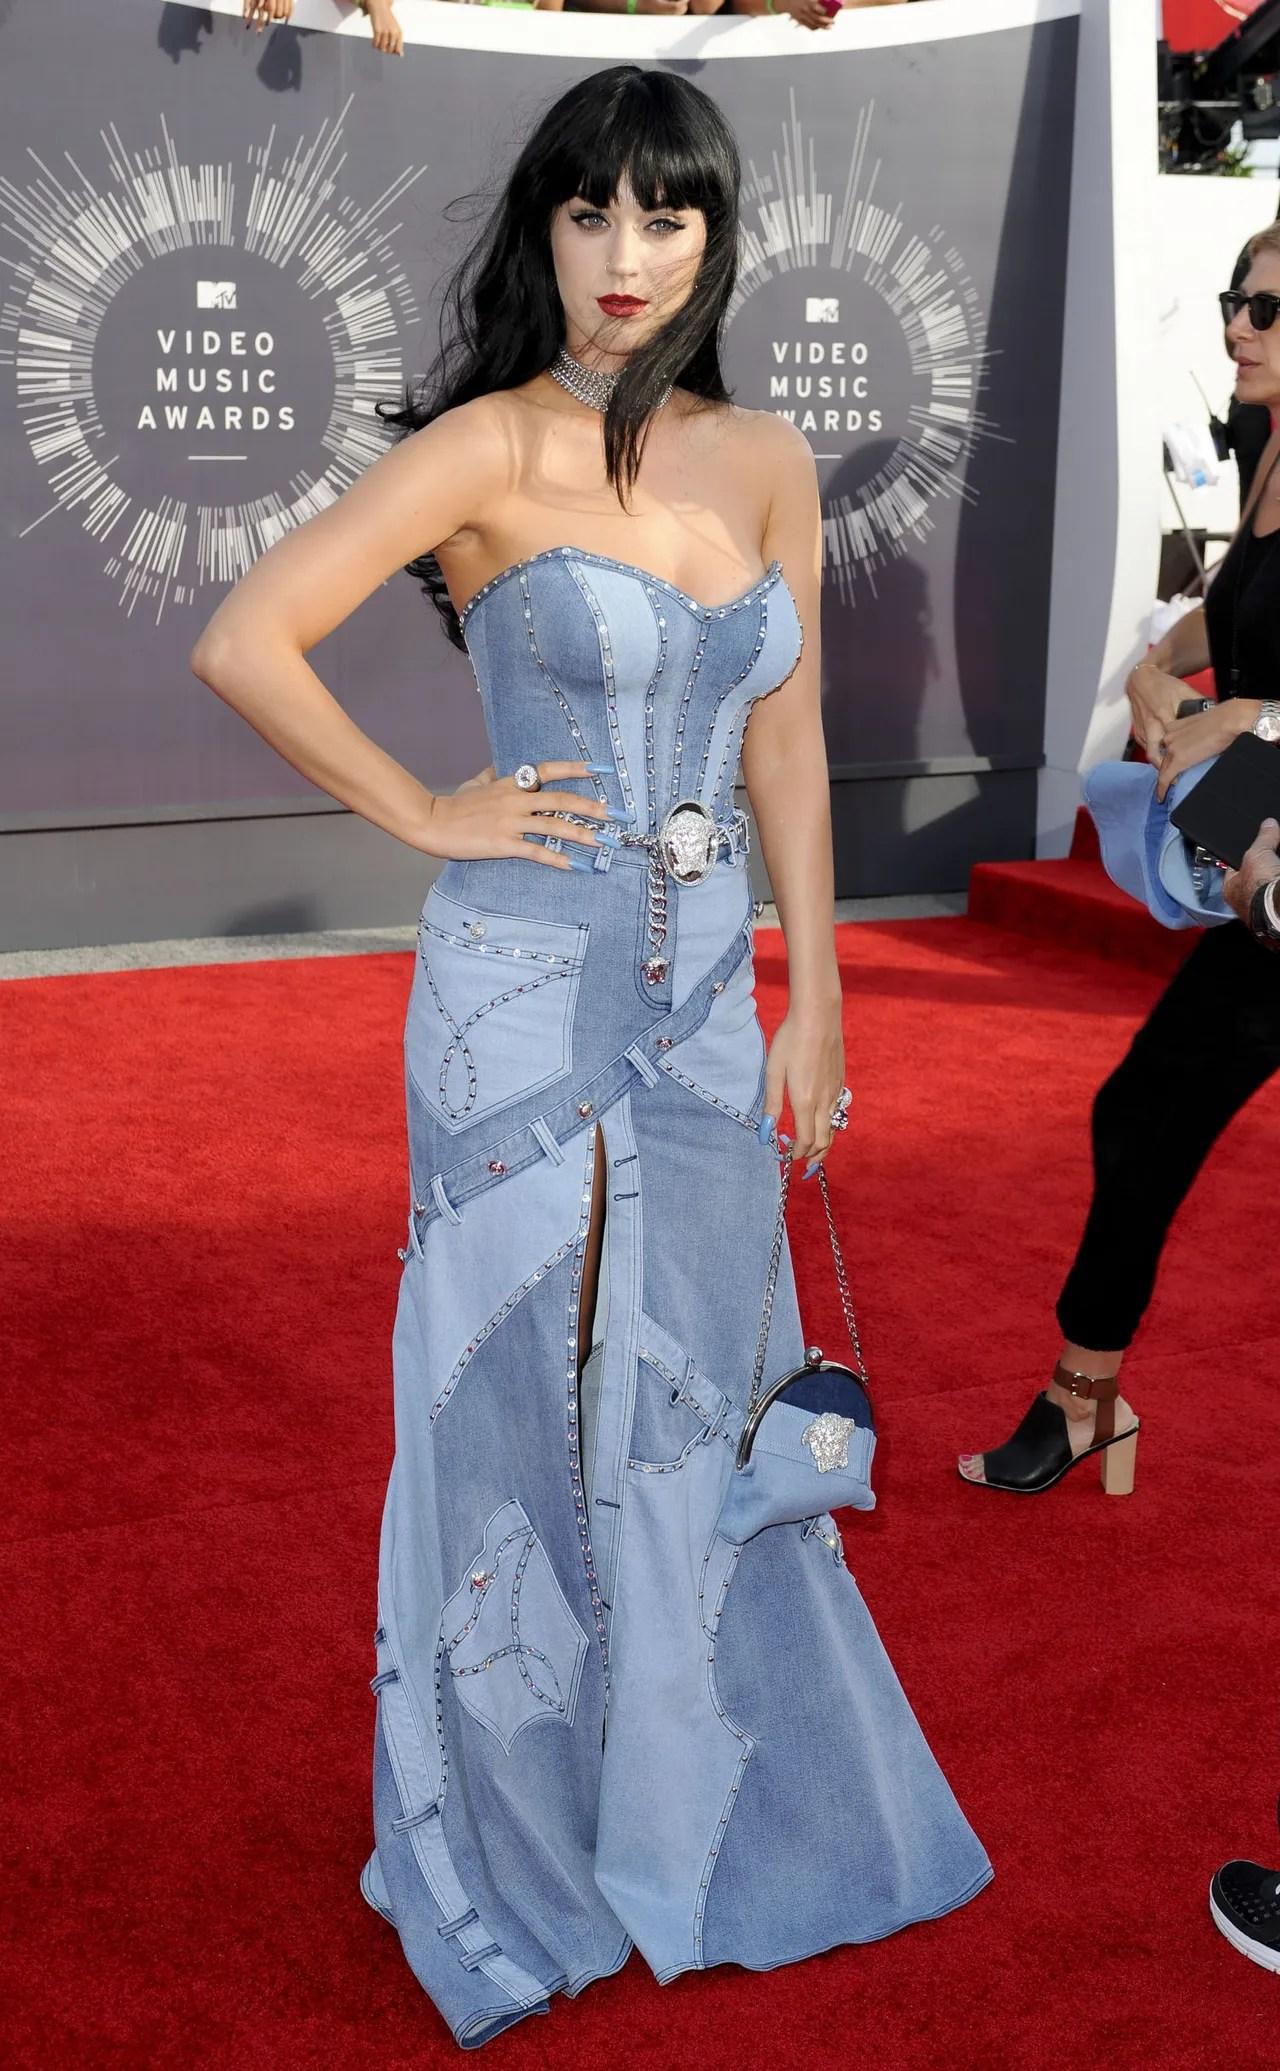 The MTV VMAs Most Memorable Red Carpet Fashion Moments